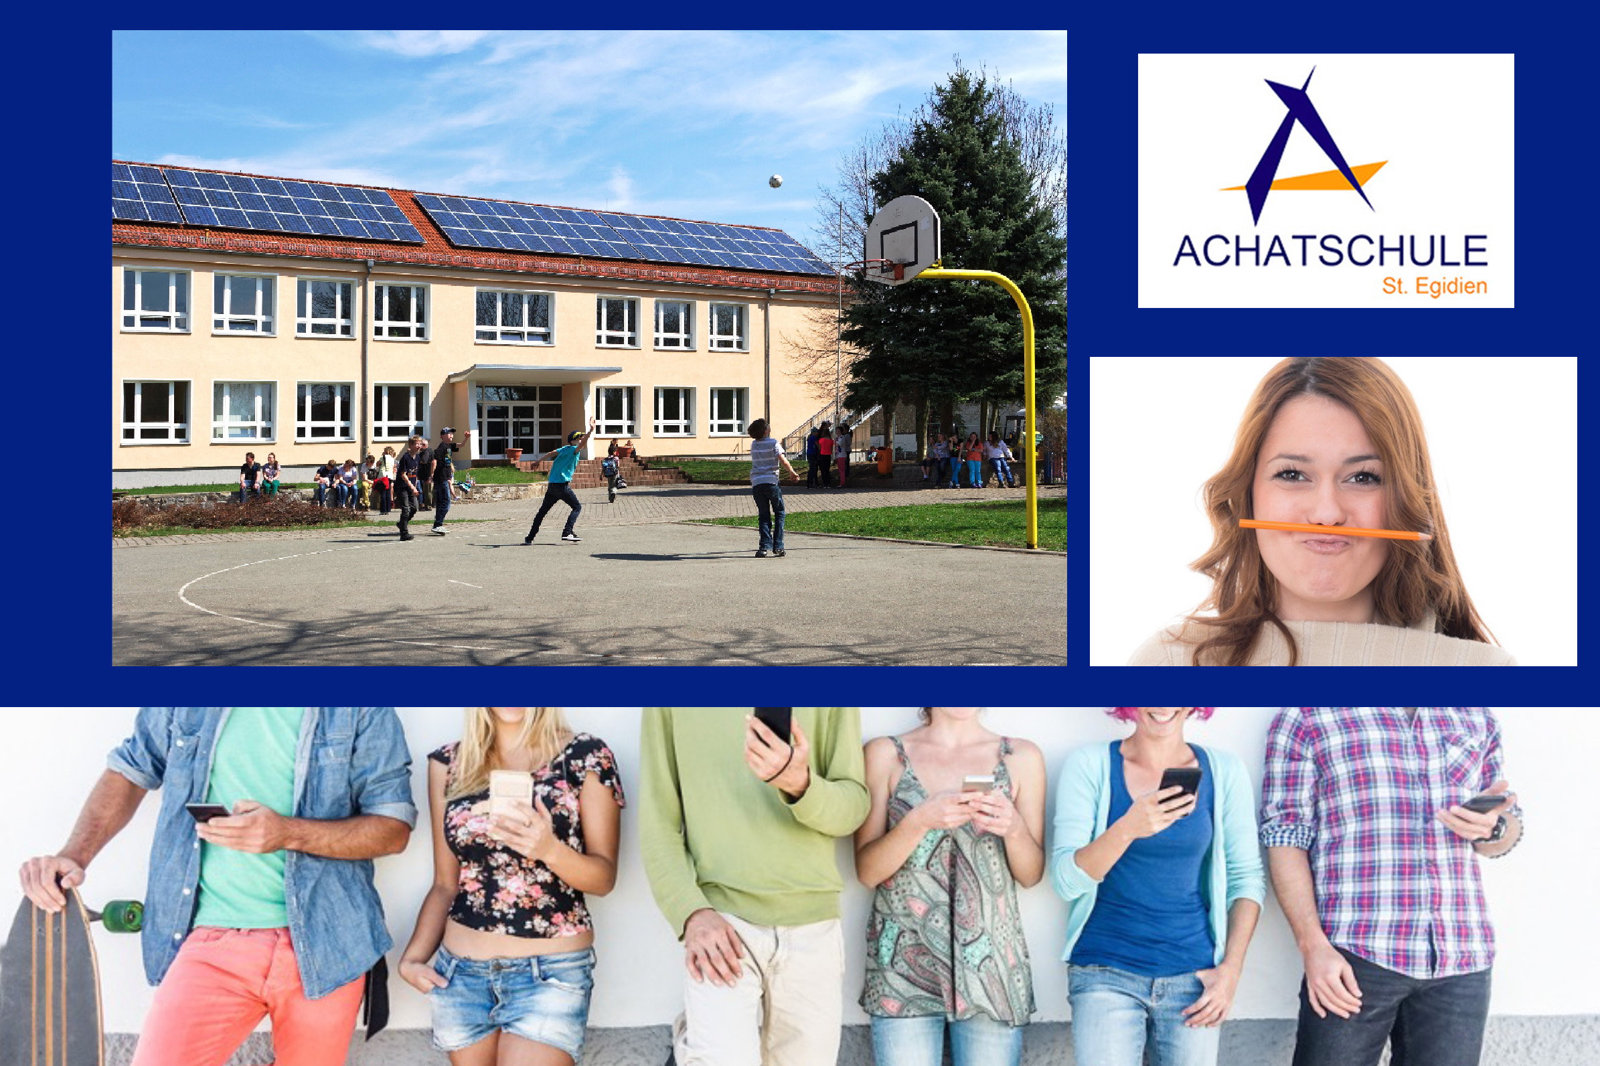 Achatschule